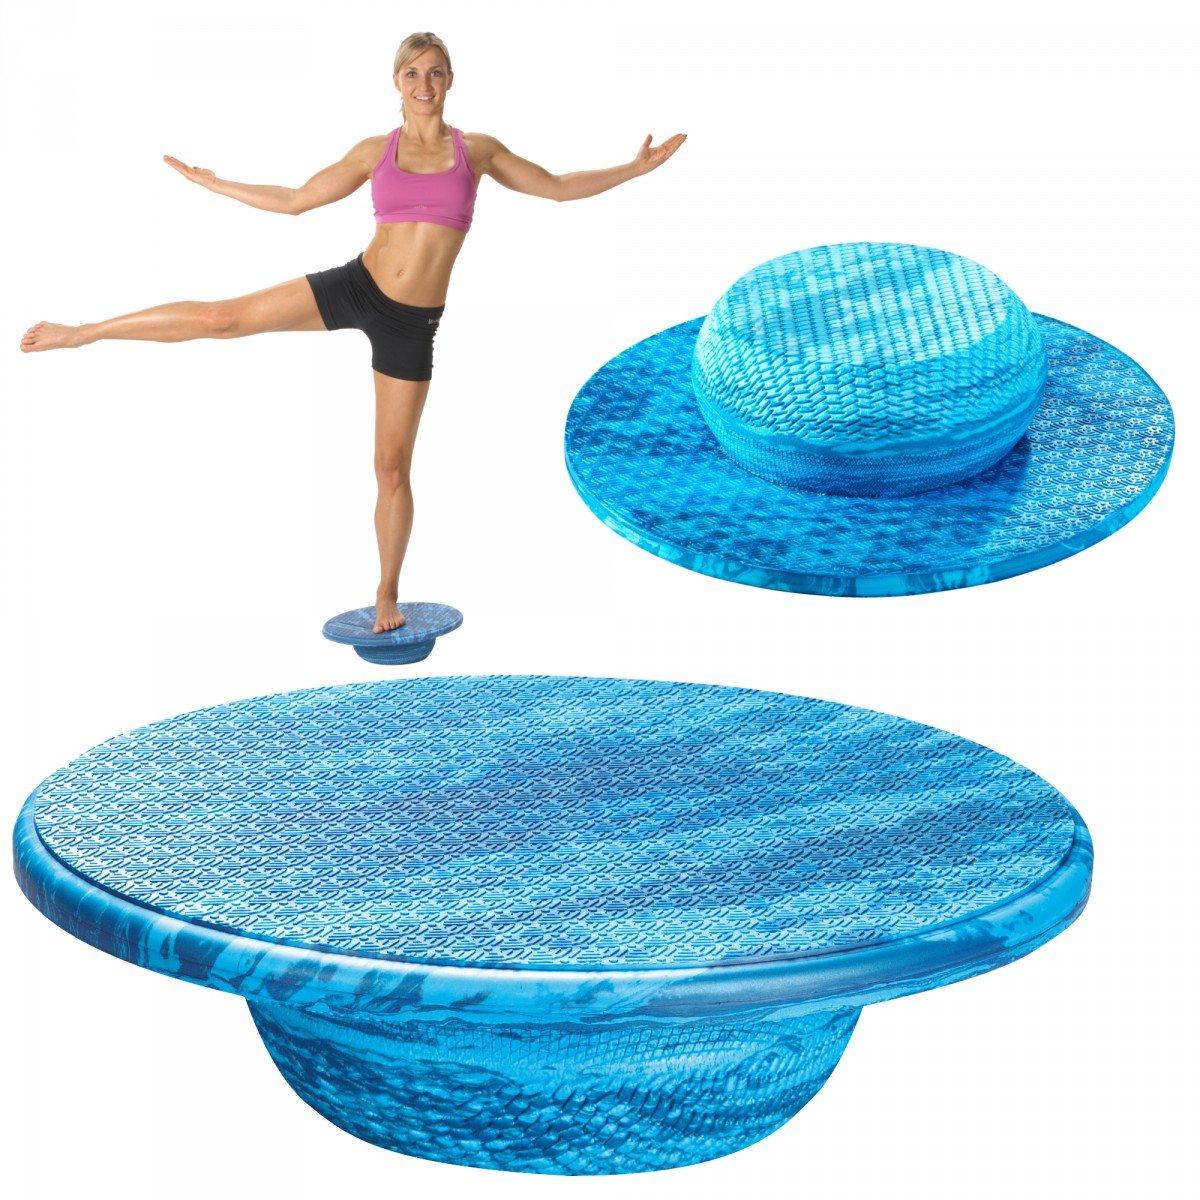 Balanza Balance Pad Circulo, Blau gemustert, 39 x 9 cm